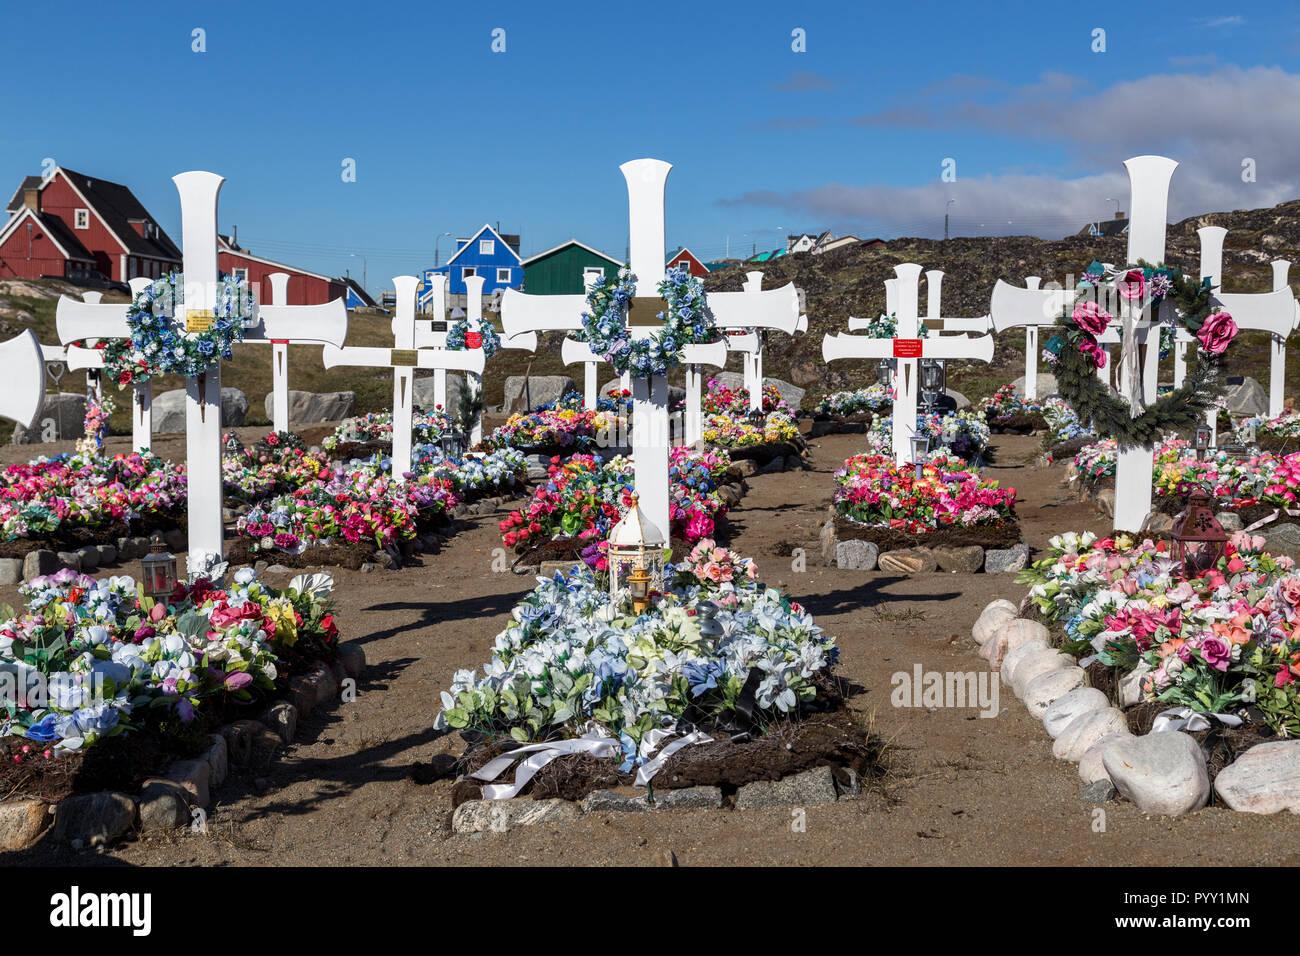 Qeqertarsuaq Cemetery, Greenland - Stock Image